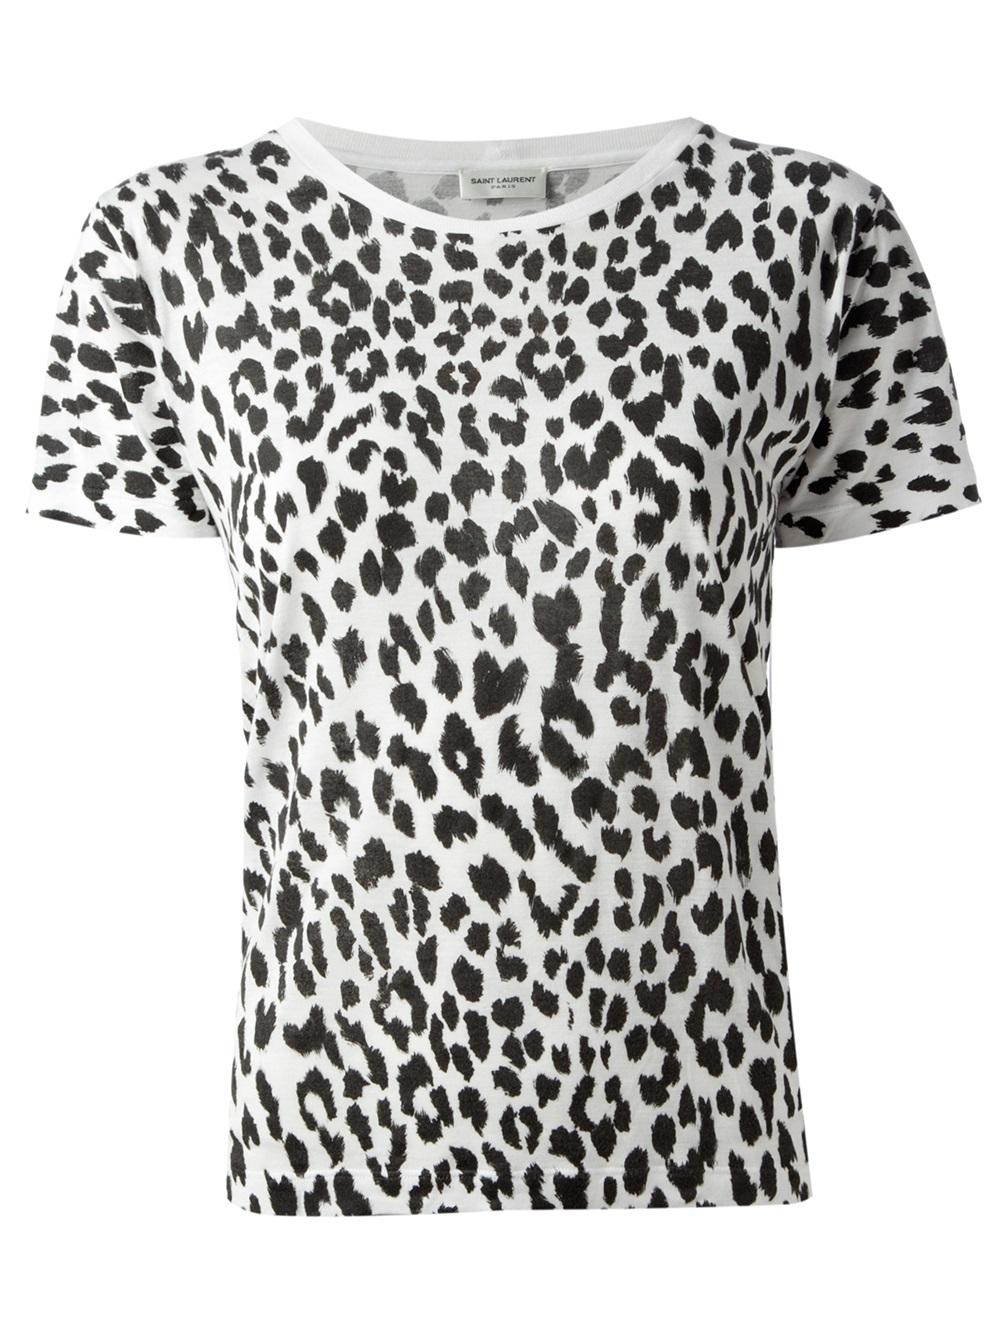 Saint laurent Leopard Print Tshirt in Black